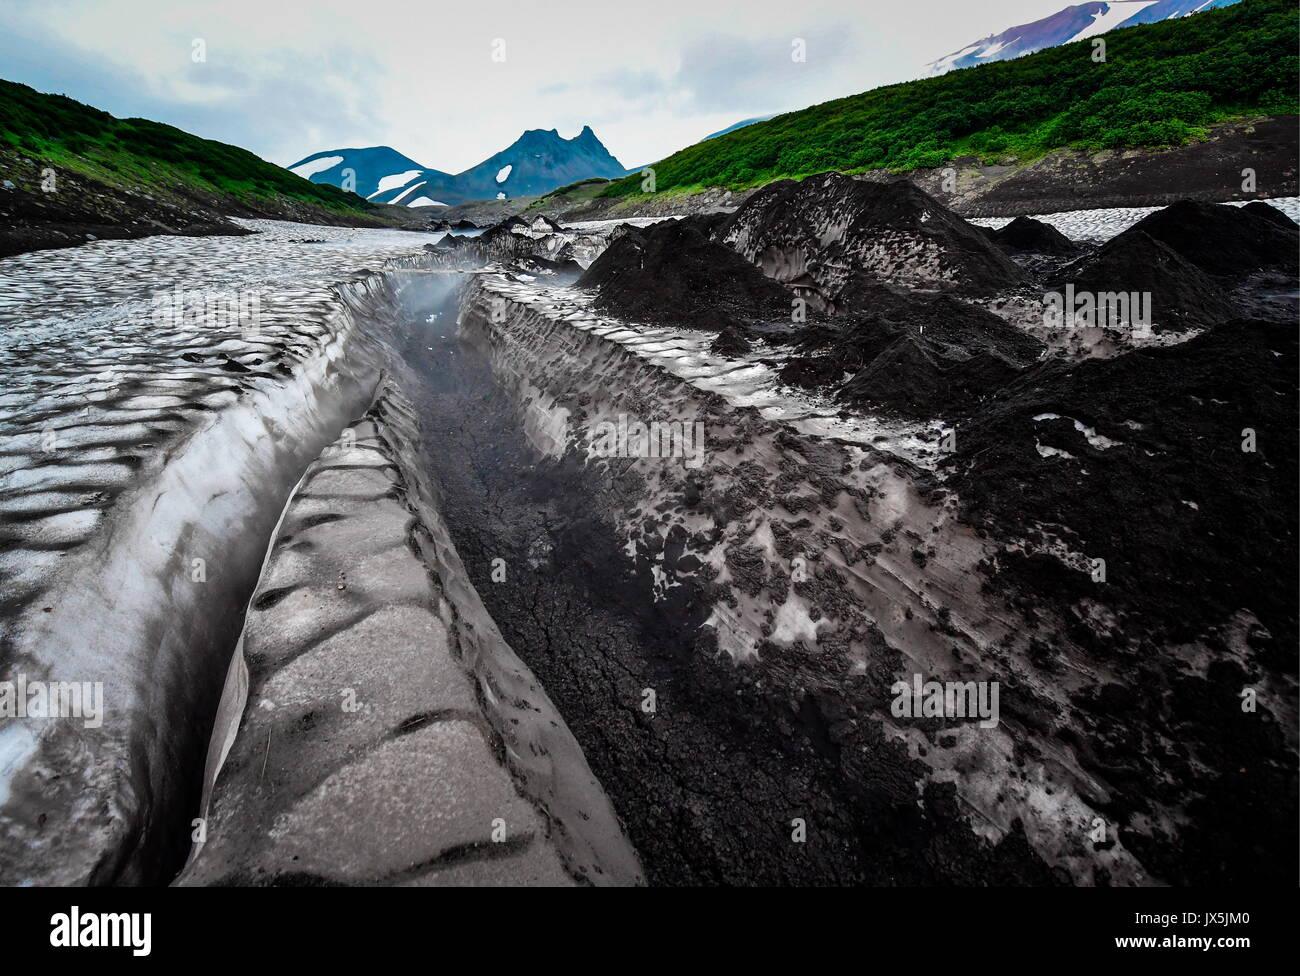 Kamtschatka, Russland. 12 Aug, 2017. Ein Gletscher am Fuße des Avachinsky aktiver stratovulkan. Credit: Yuri Smityuk/TASS/Alamy Stockfoto